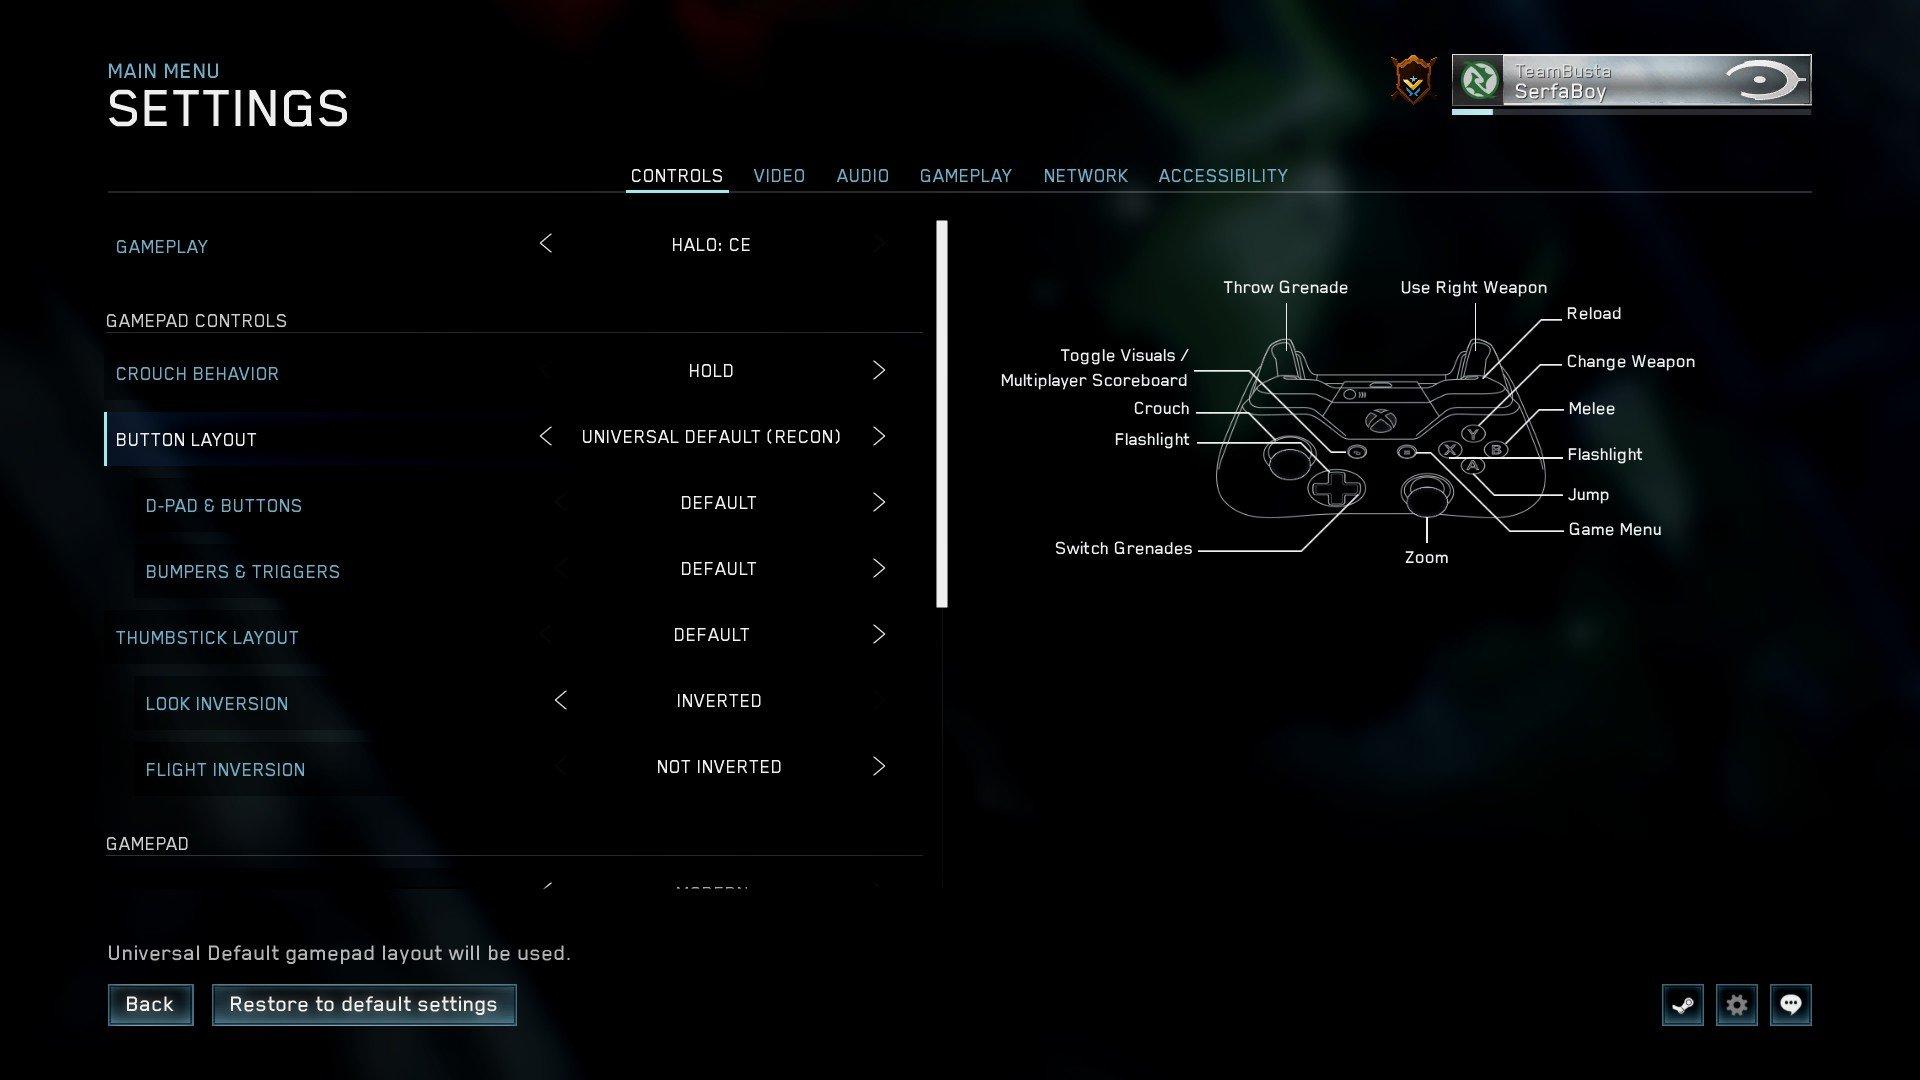 halo cea mcc pc controller universal default recon